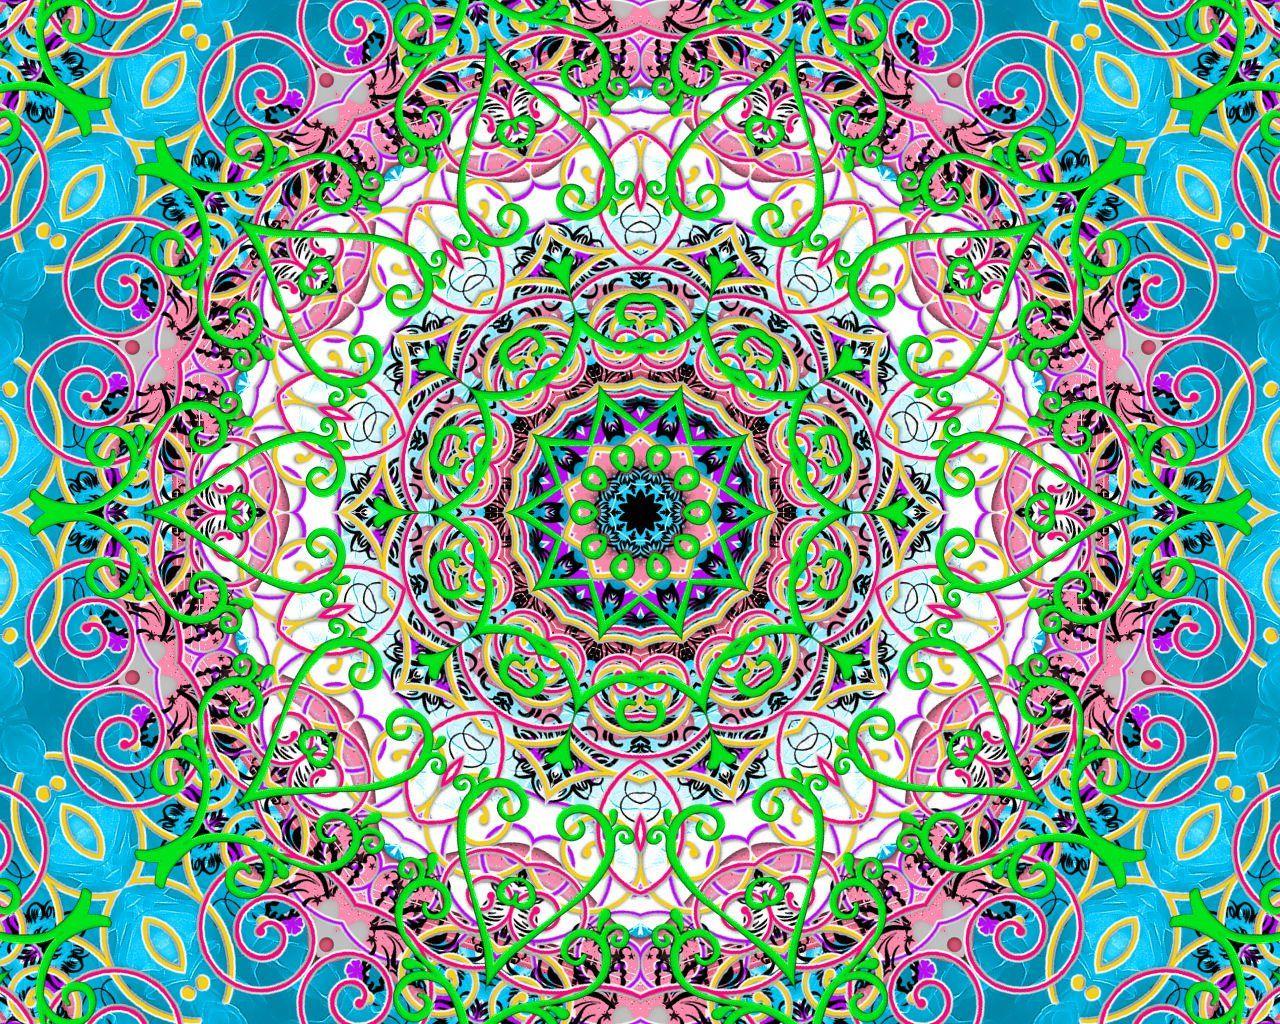 Color art mandala wonders - Neon Bliss